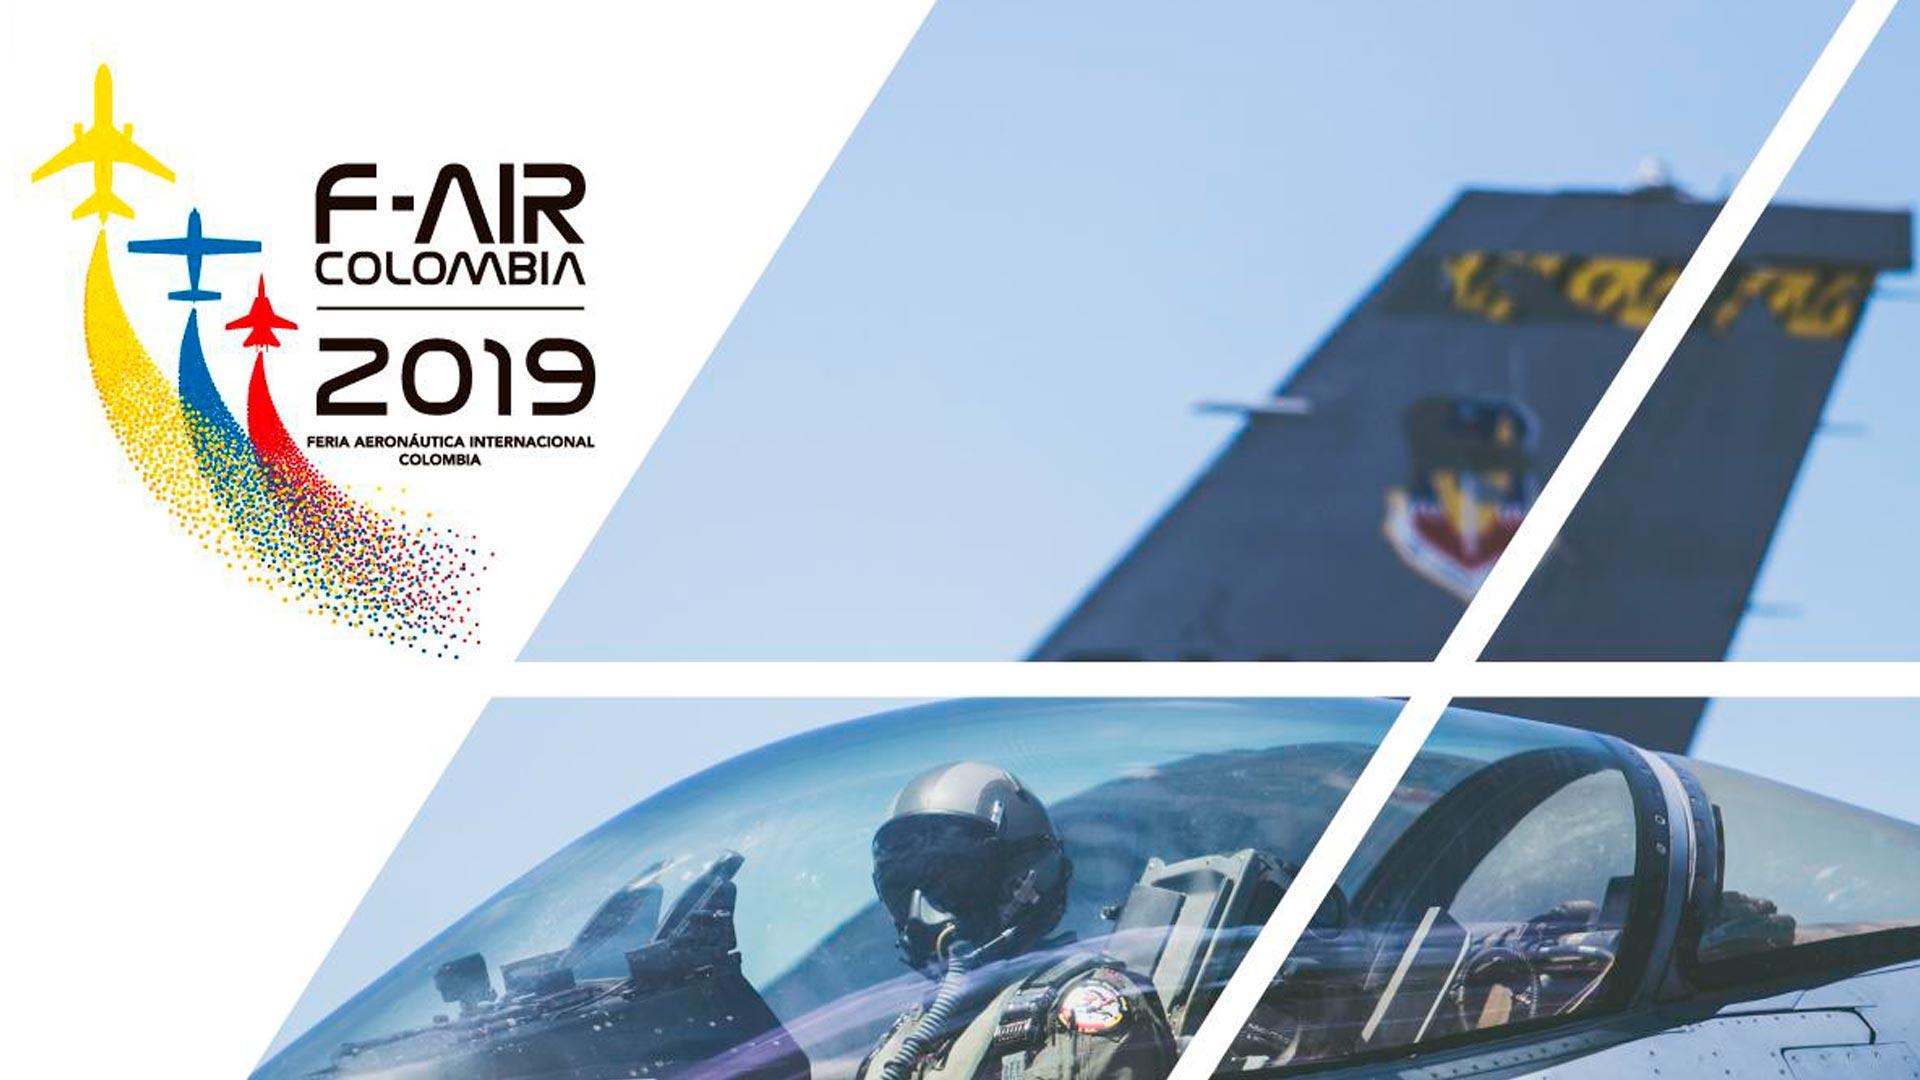 F-aircolombia 2019